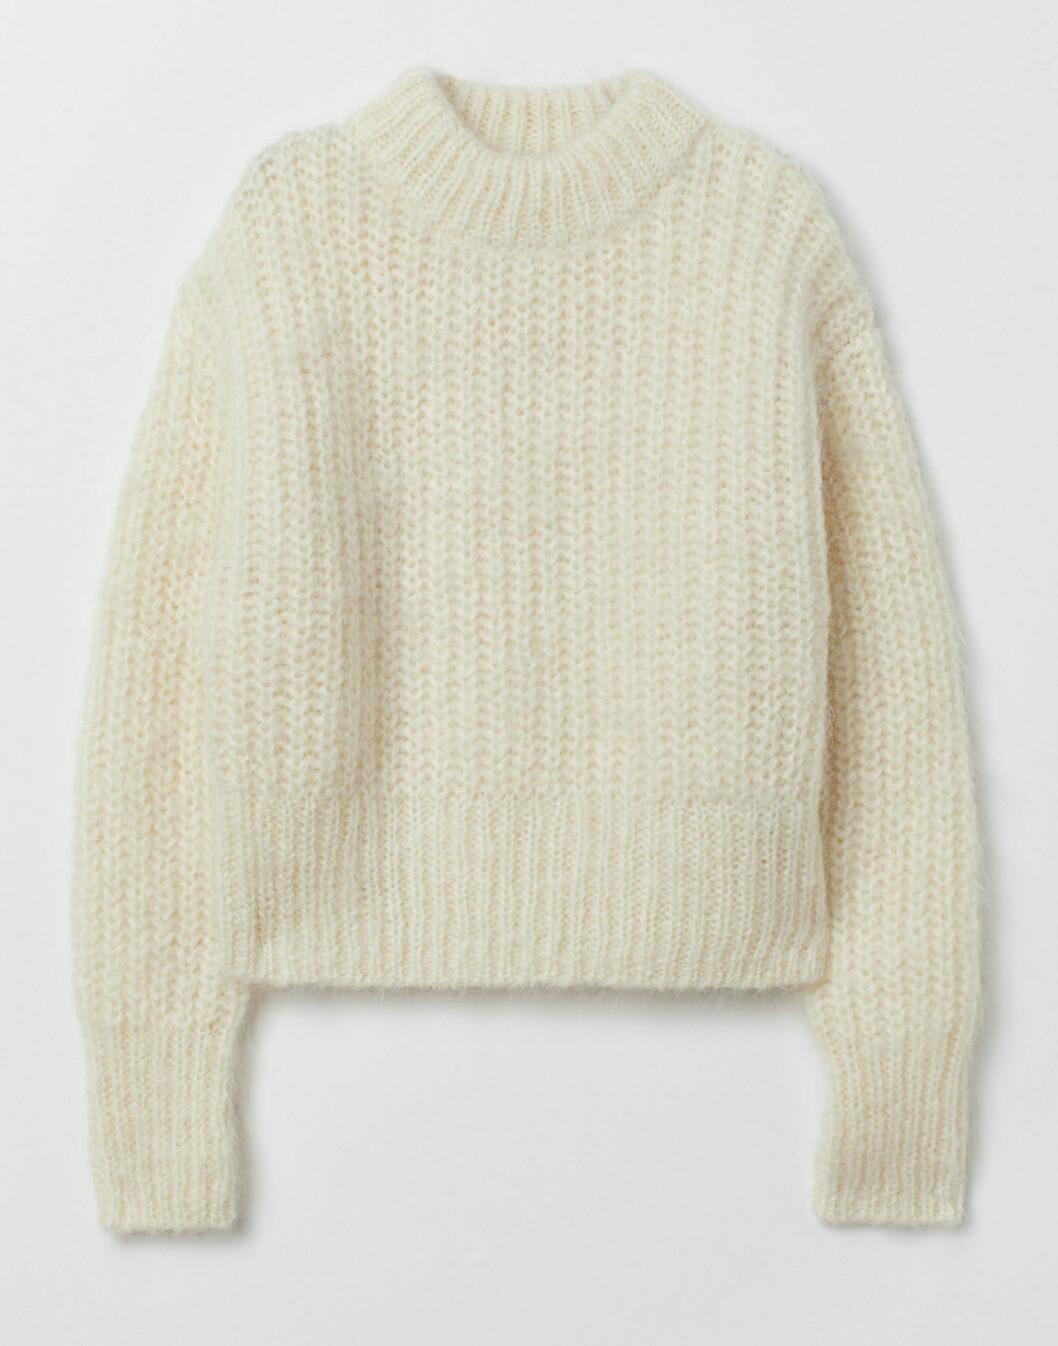 Vit stickad tröja från H&M